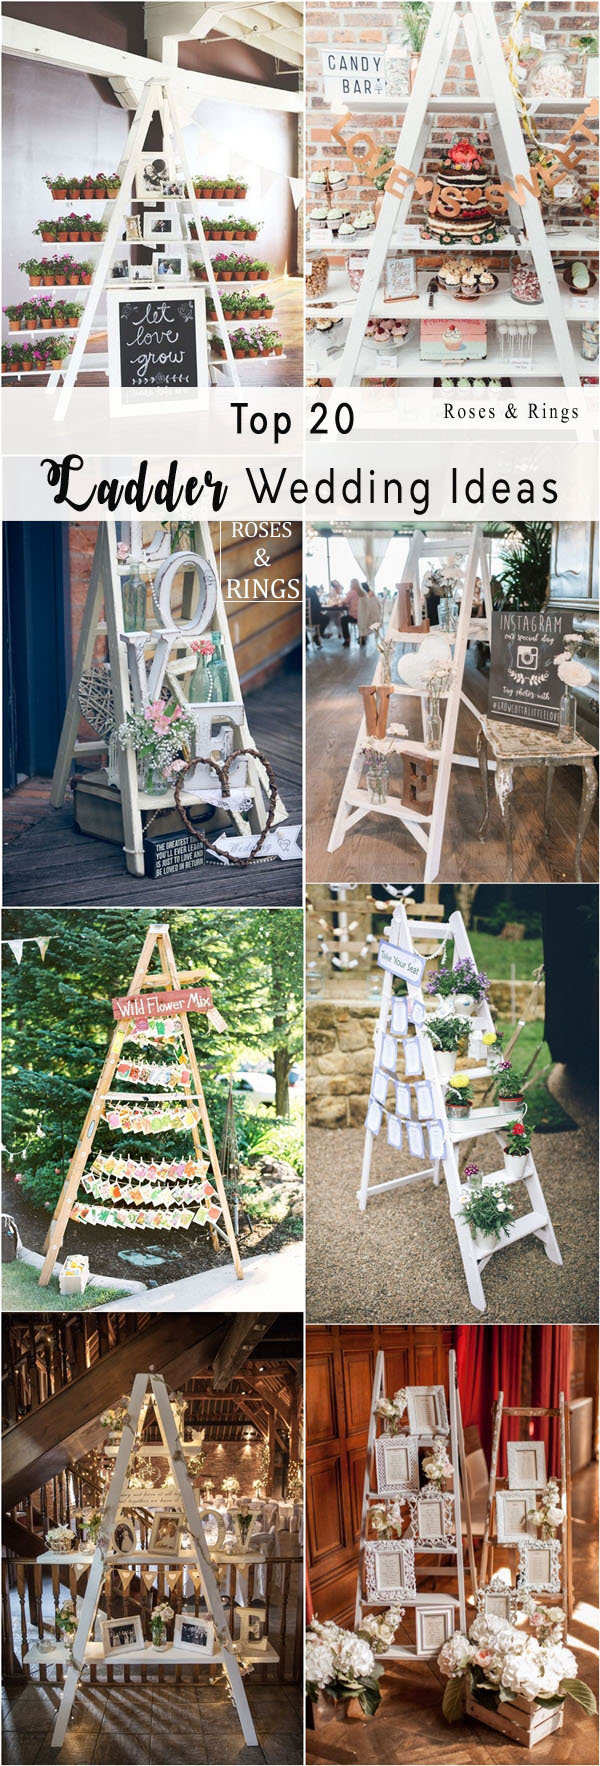 Top 20 Vintage Wooden Ladder Wedding Decor Ideas Roses Rings